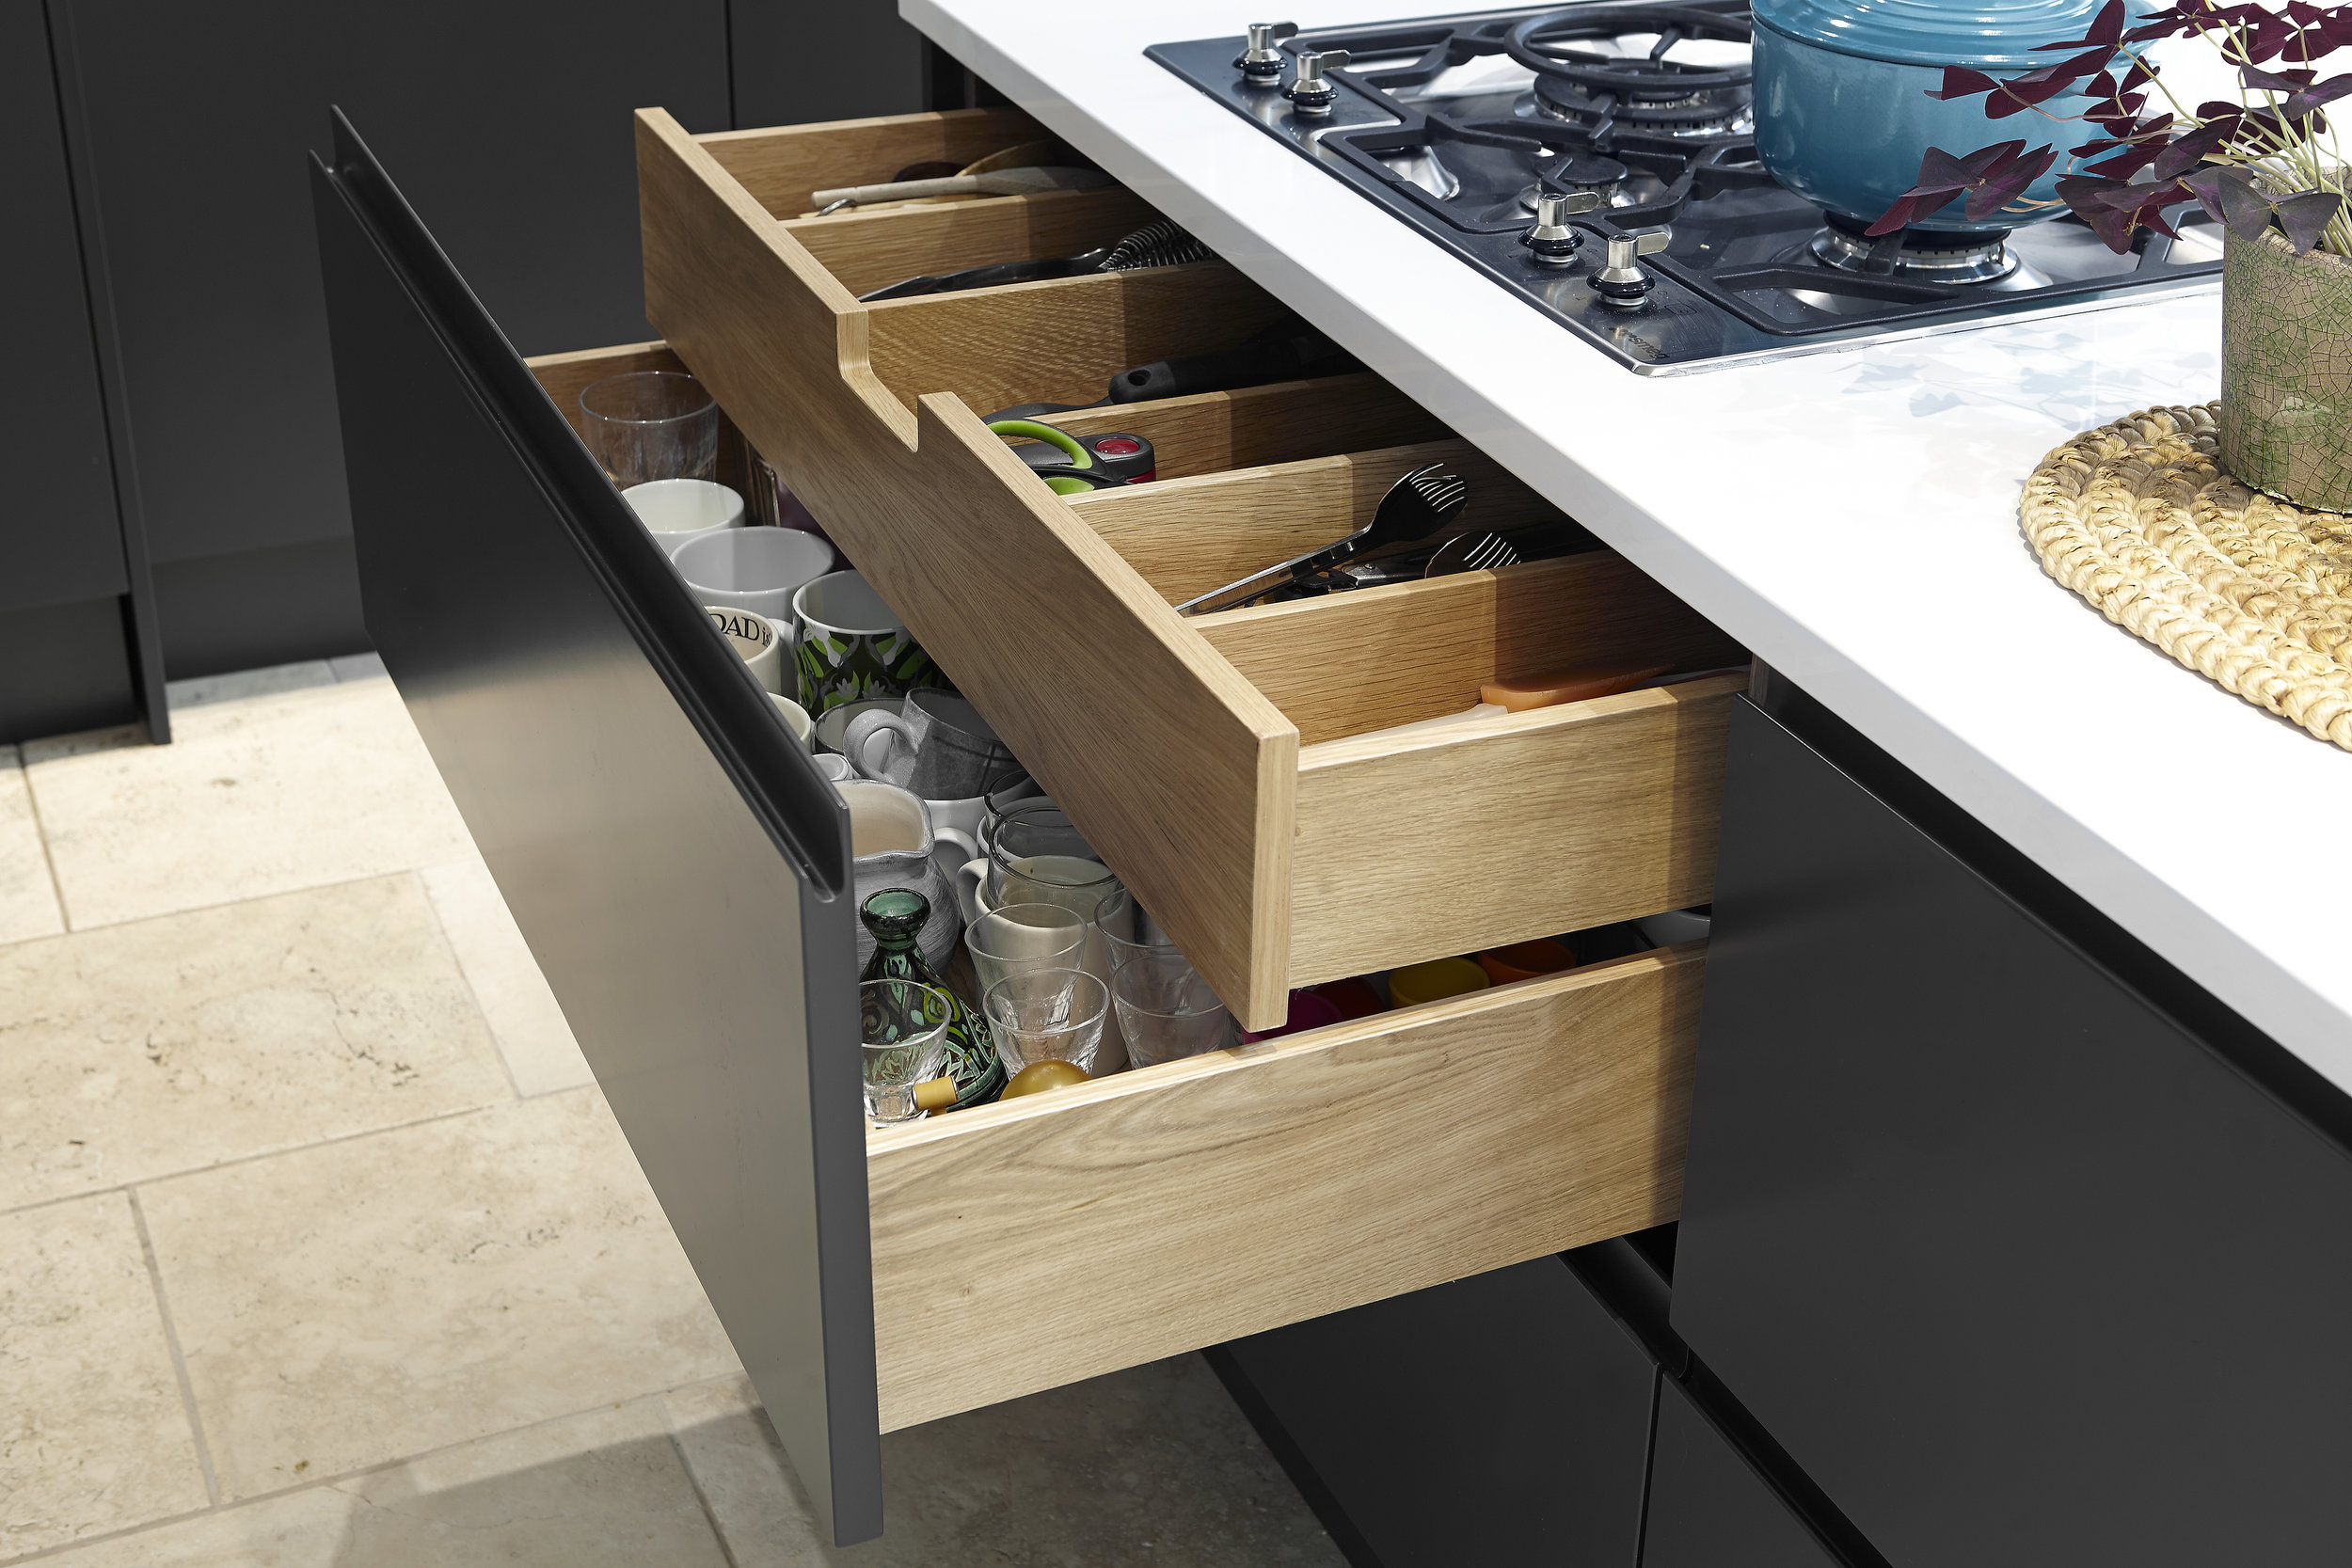 kitchens1139.jpg